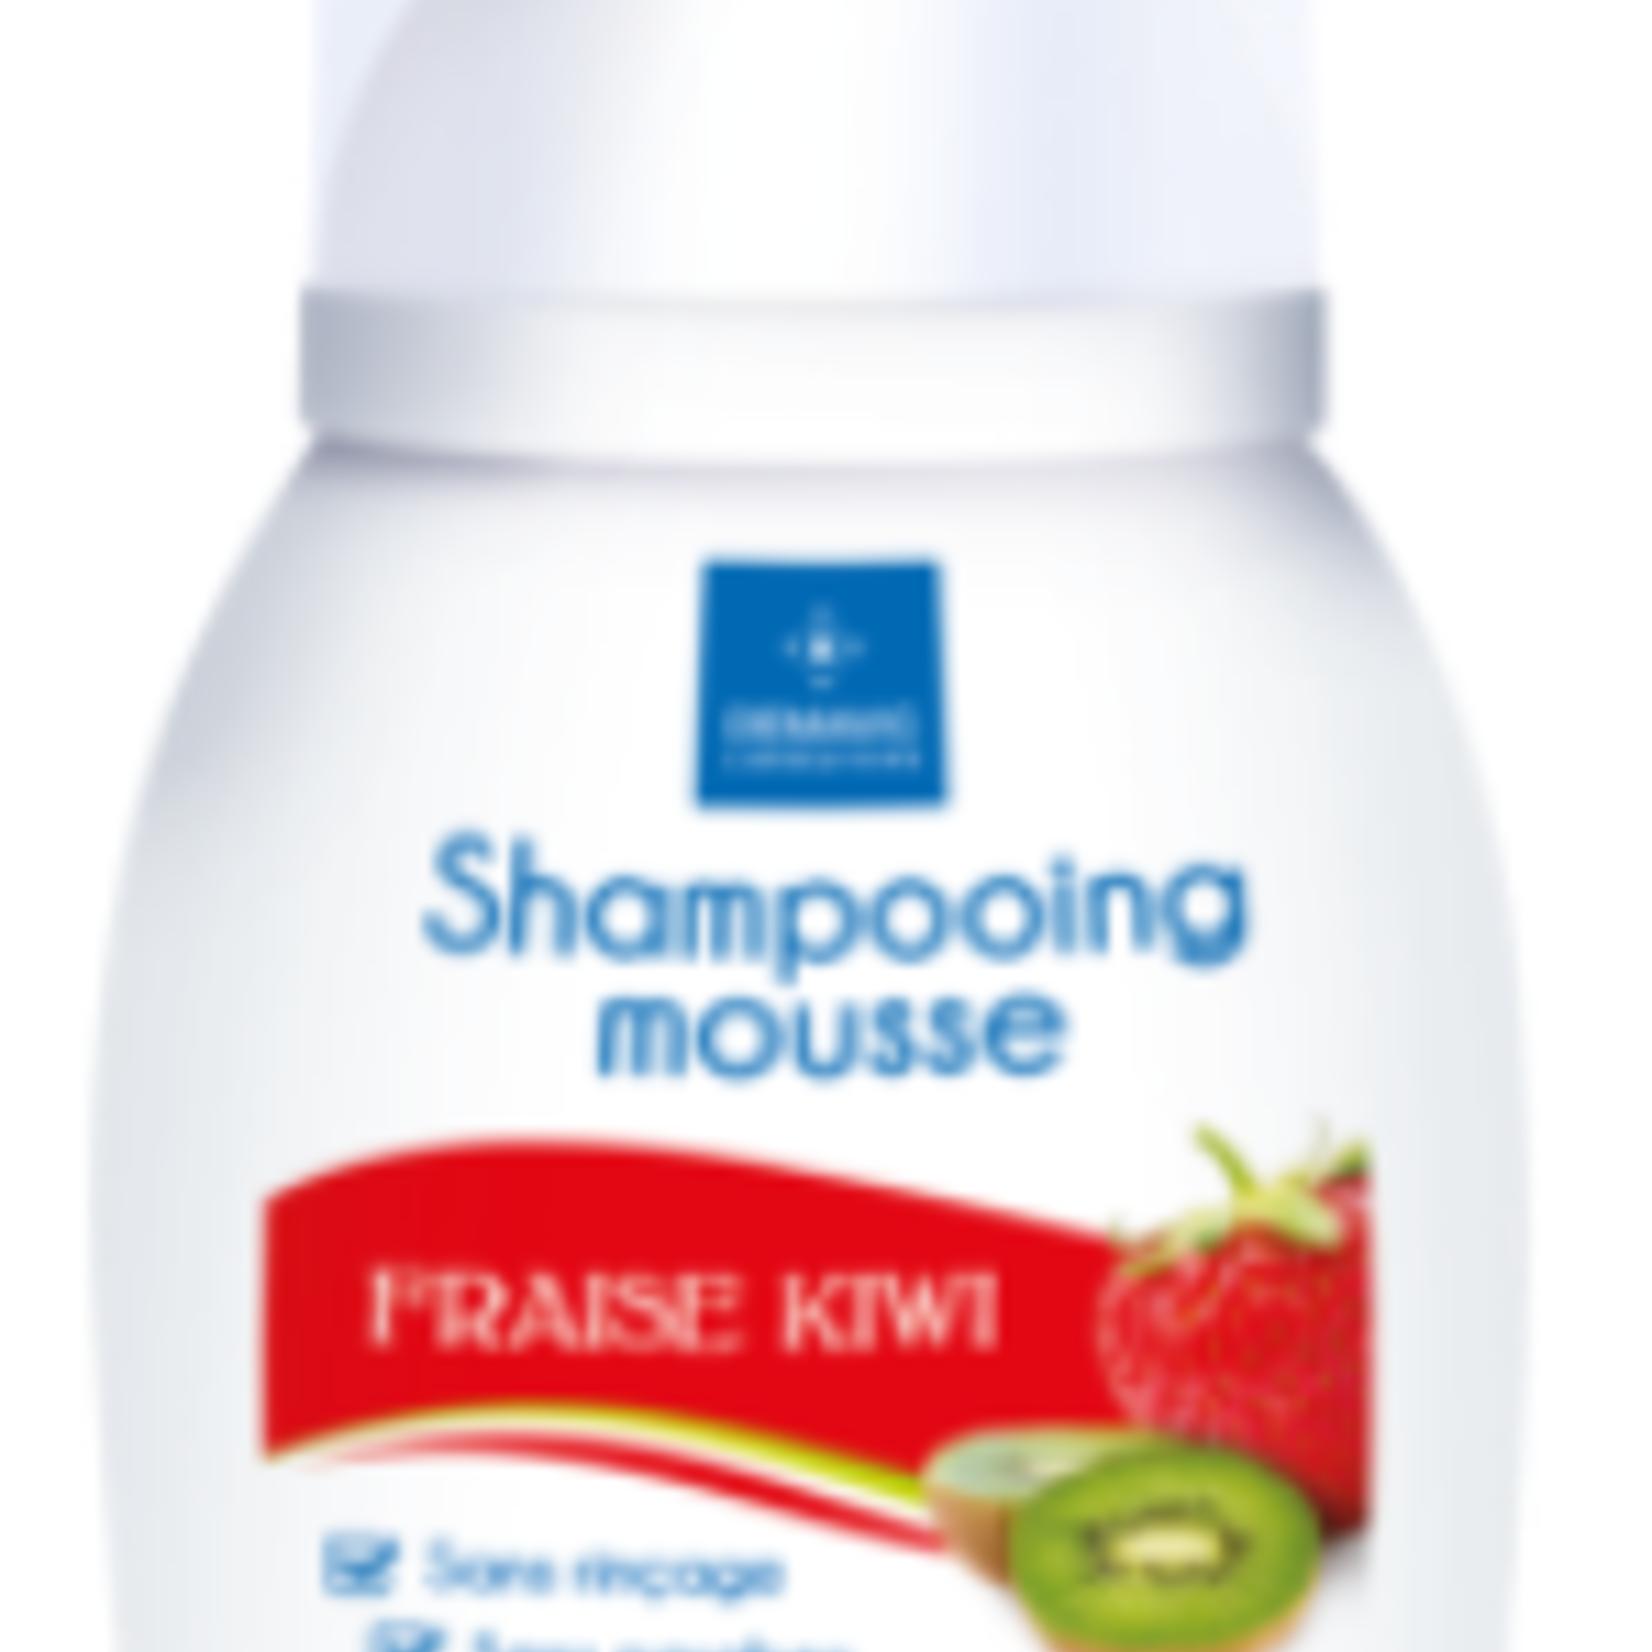 Demavic Foam Shampoo - KIWi Strawberry - 150 ml